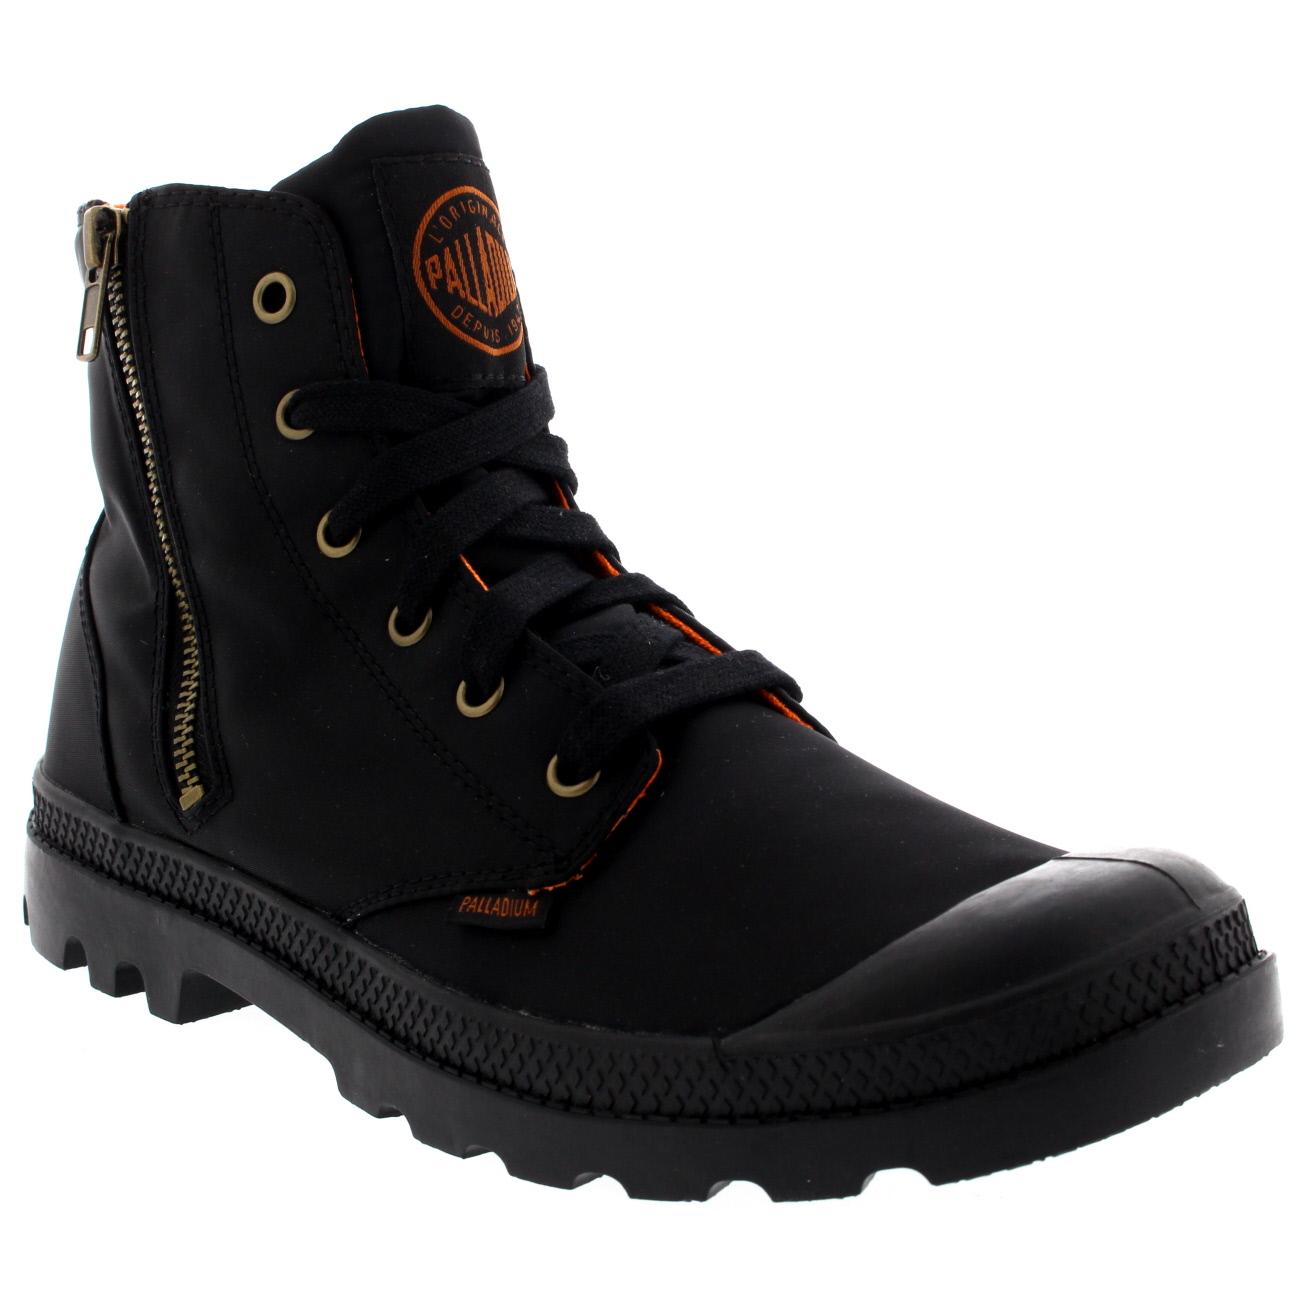 Pammadium Pampa Hi Cuff Boots